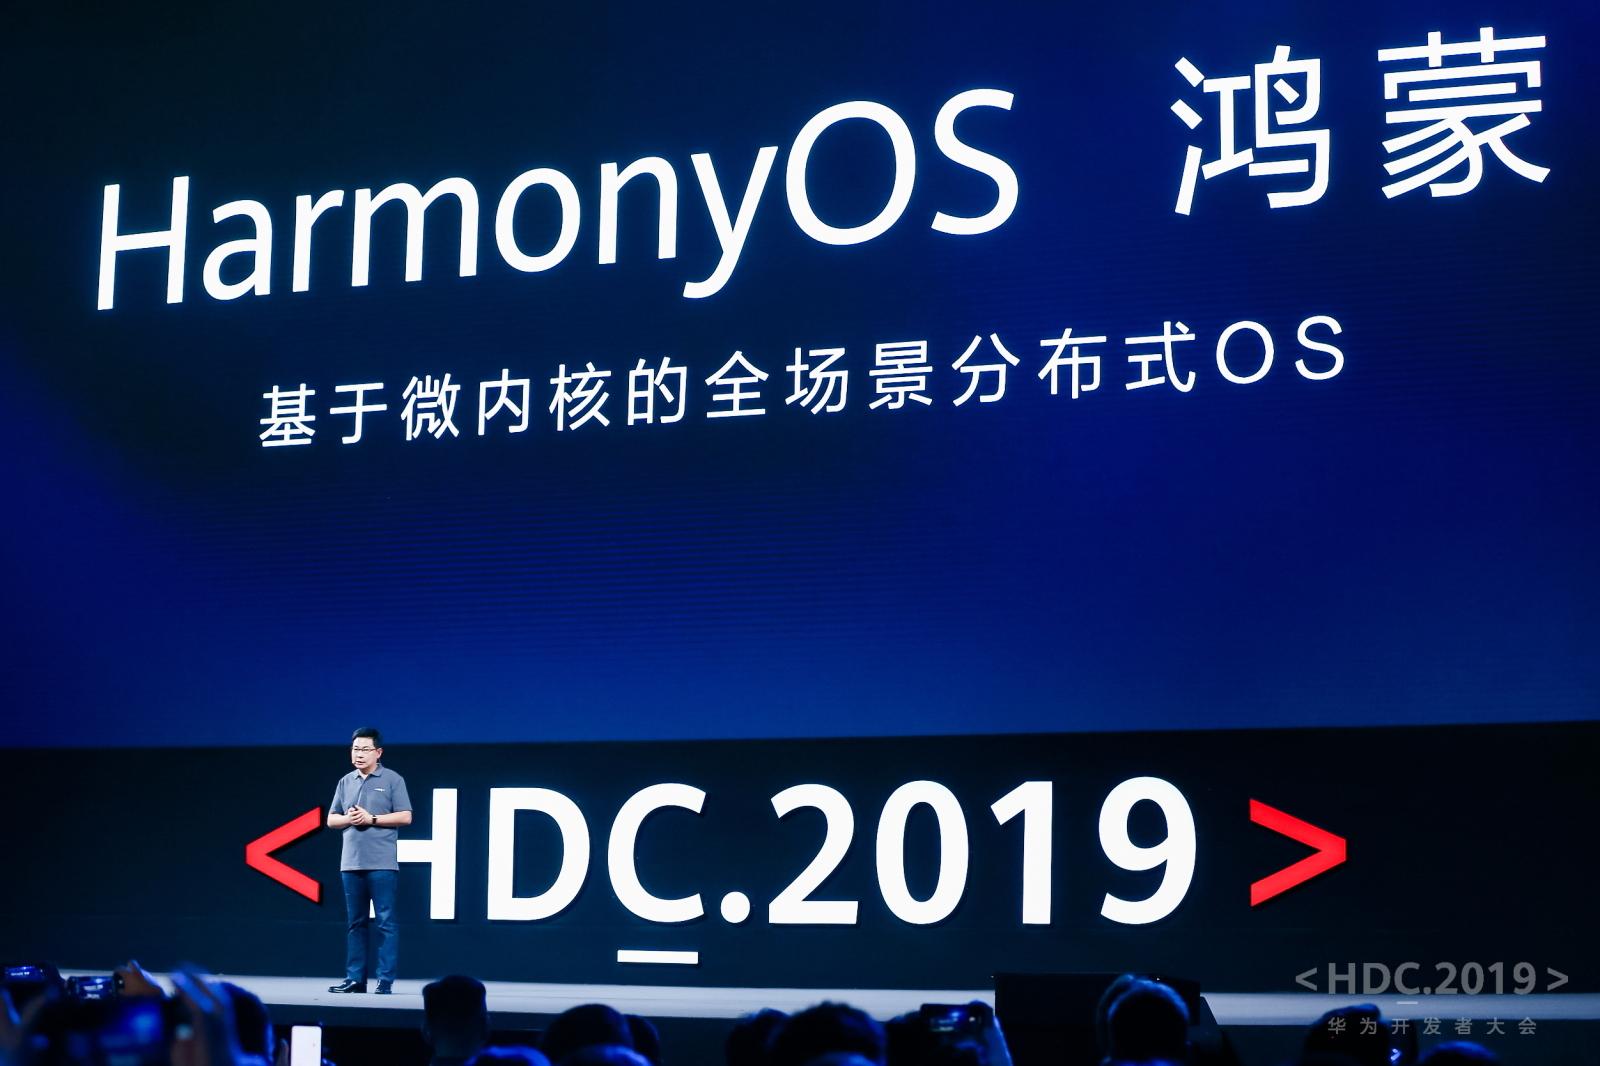 hdc_harmonyos_1.jpg